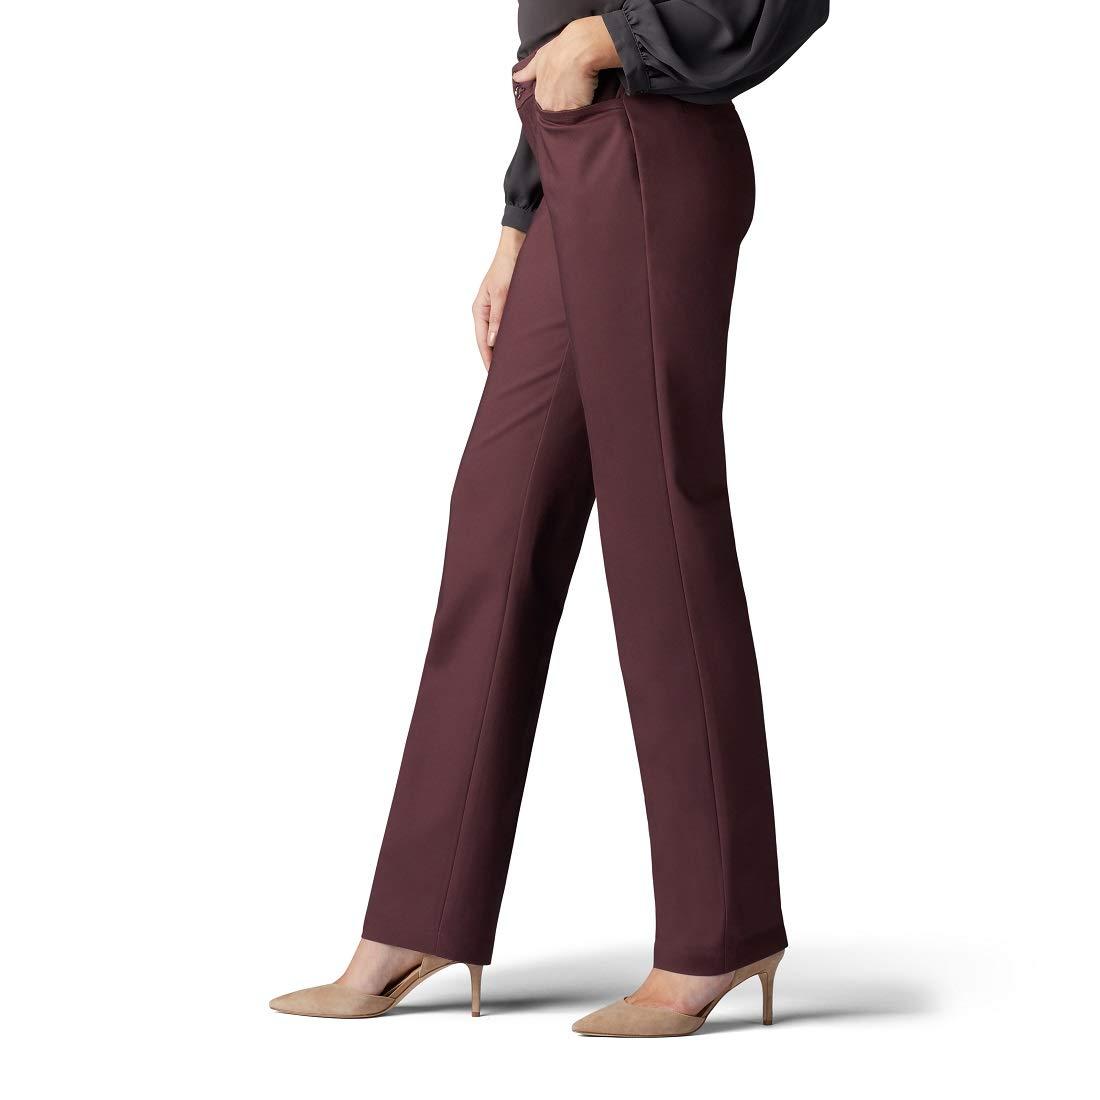 LEE Womens Petite Secretly Shapes Regular Fit Straight Leg Pant